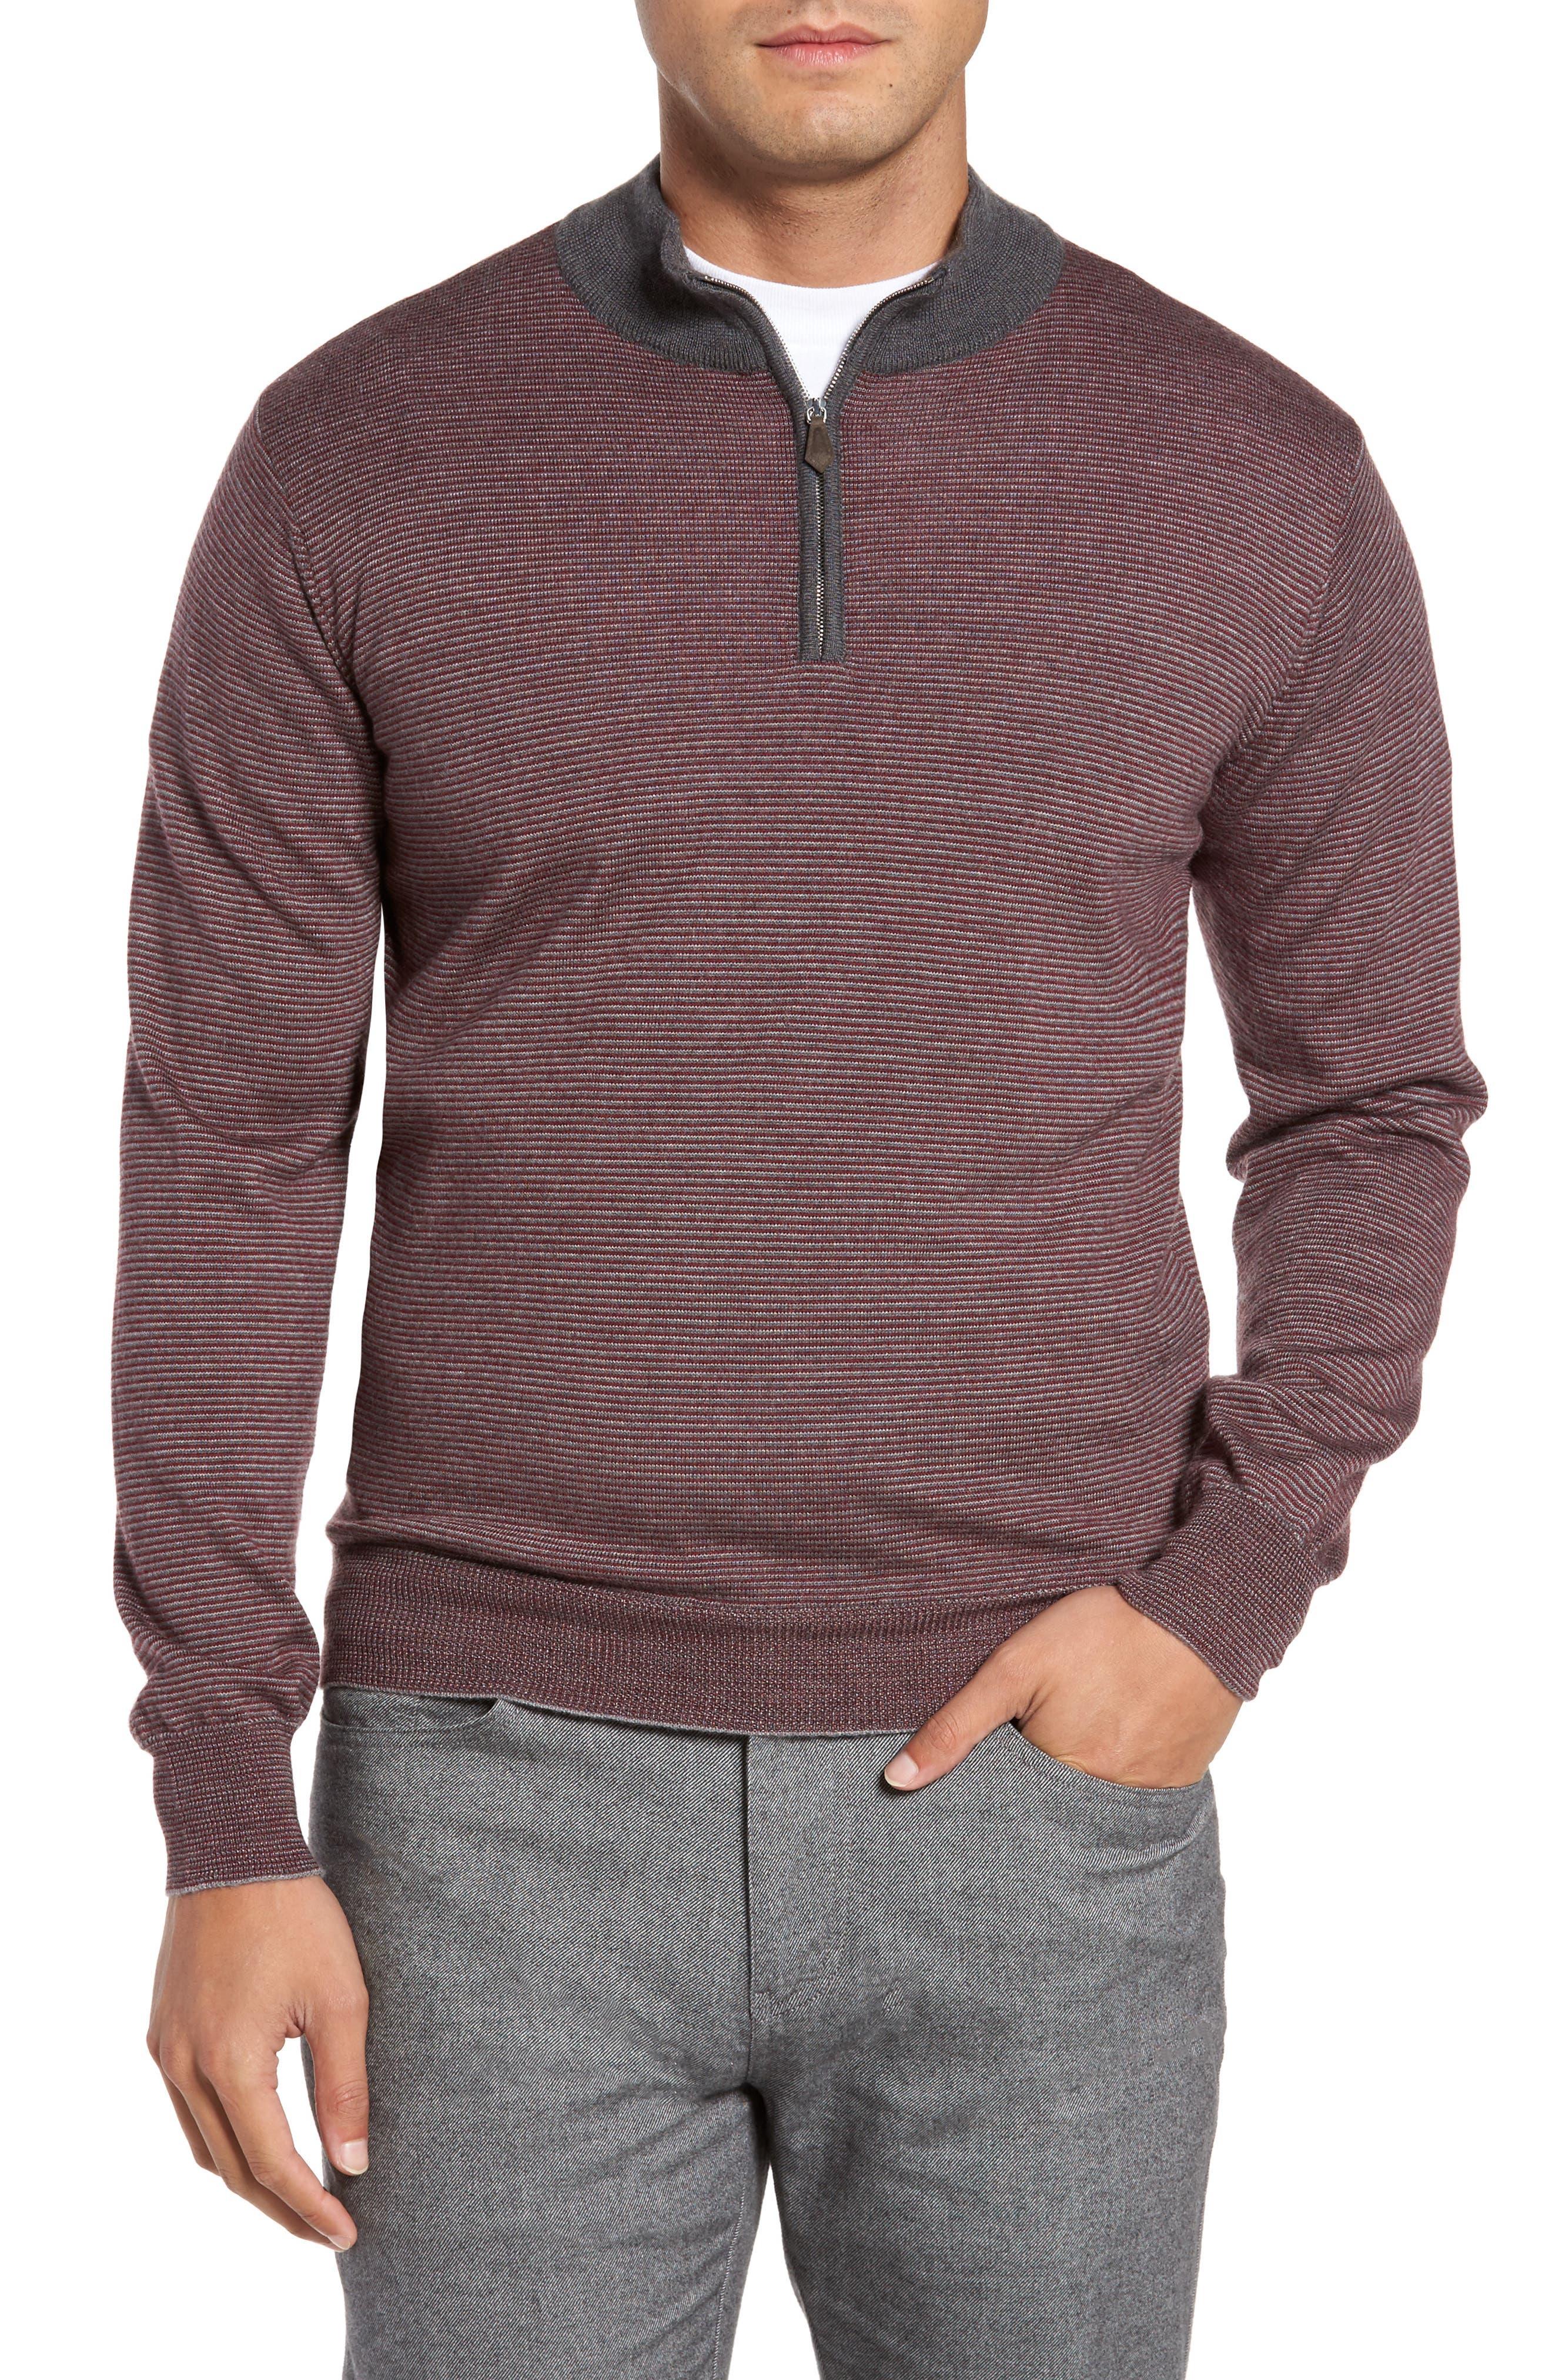 Trichrome Stripe Merino Wool Blend Sweater,                         Main,                         color, 930